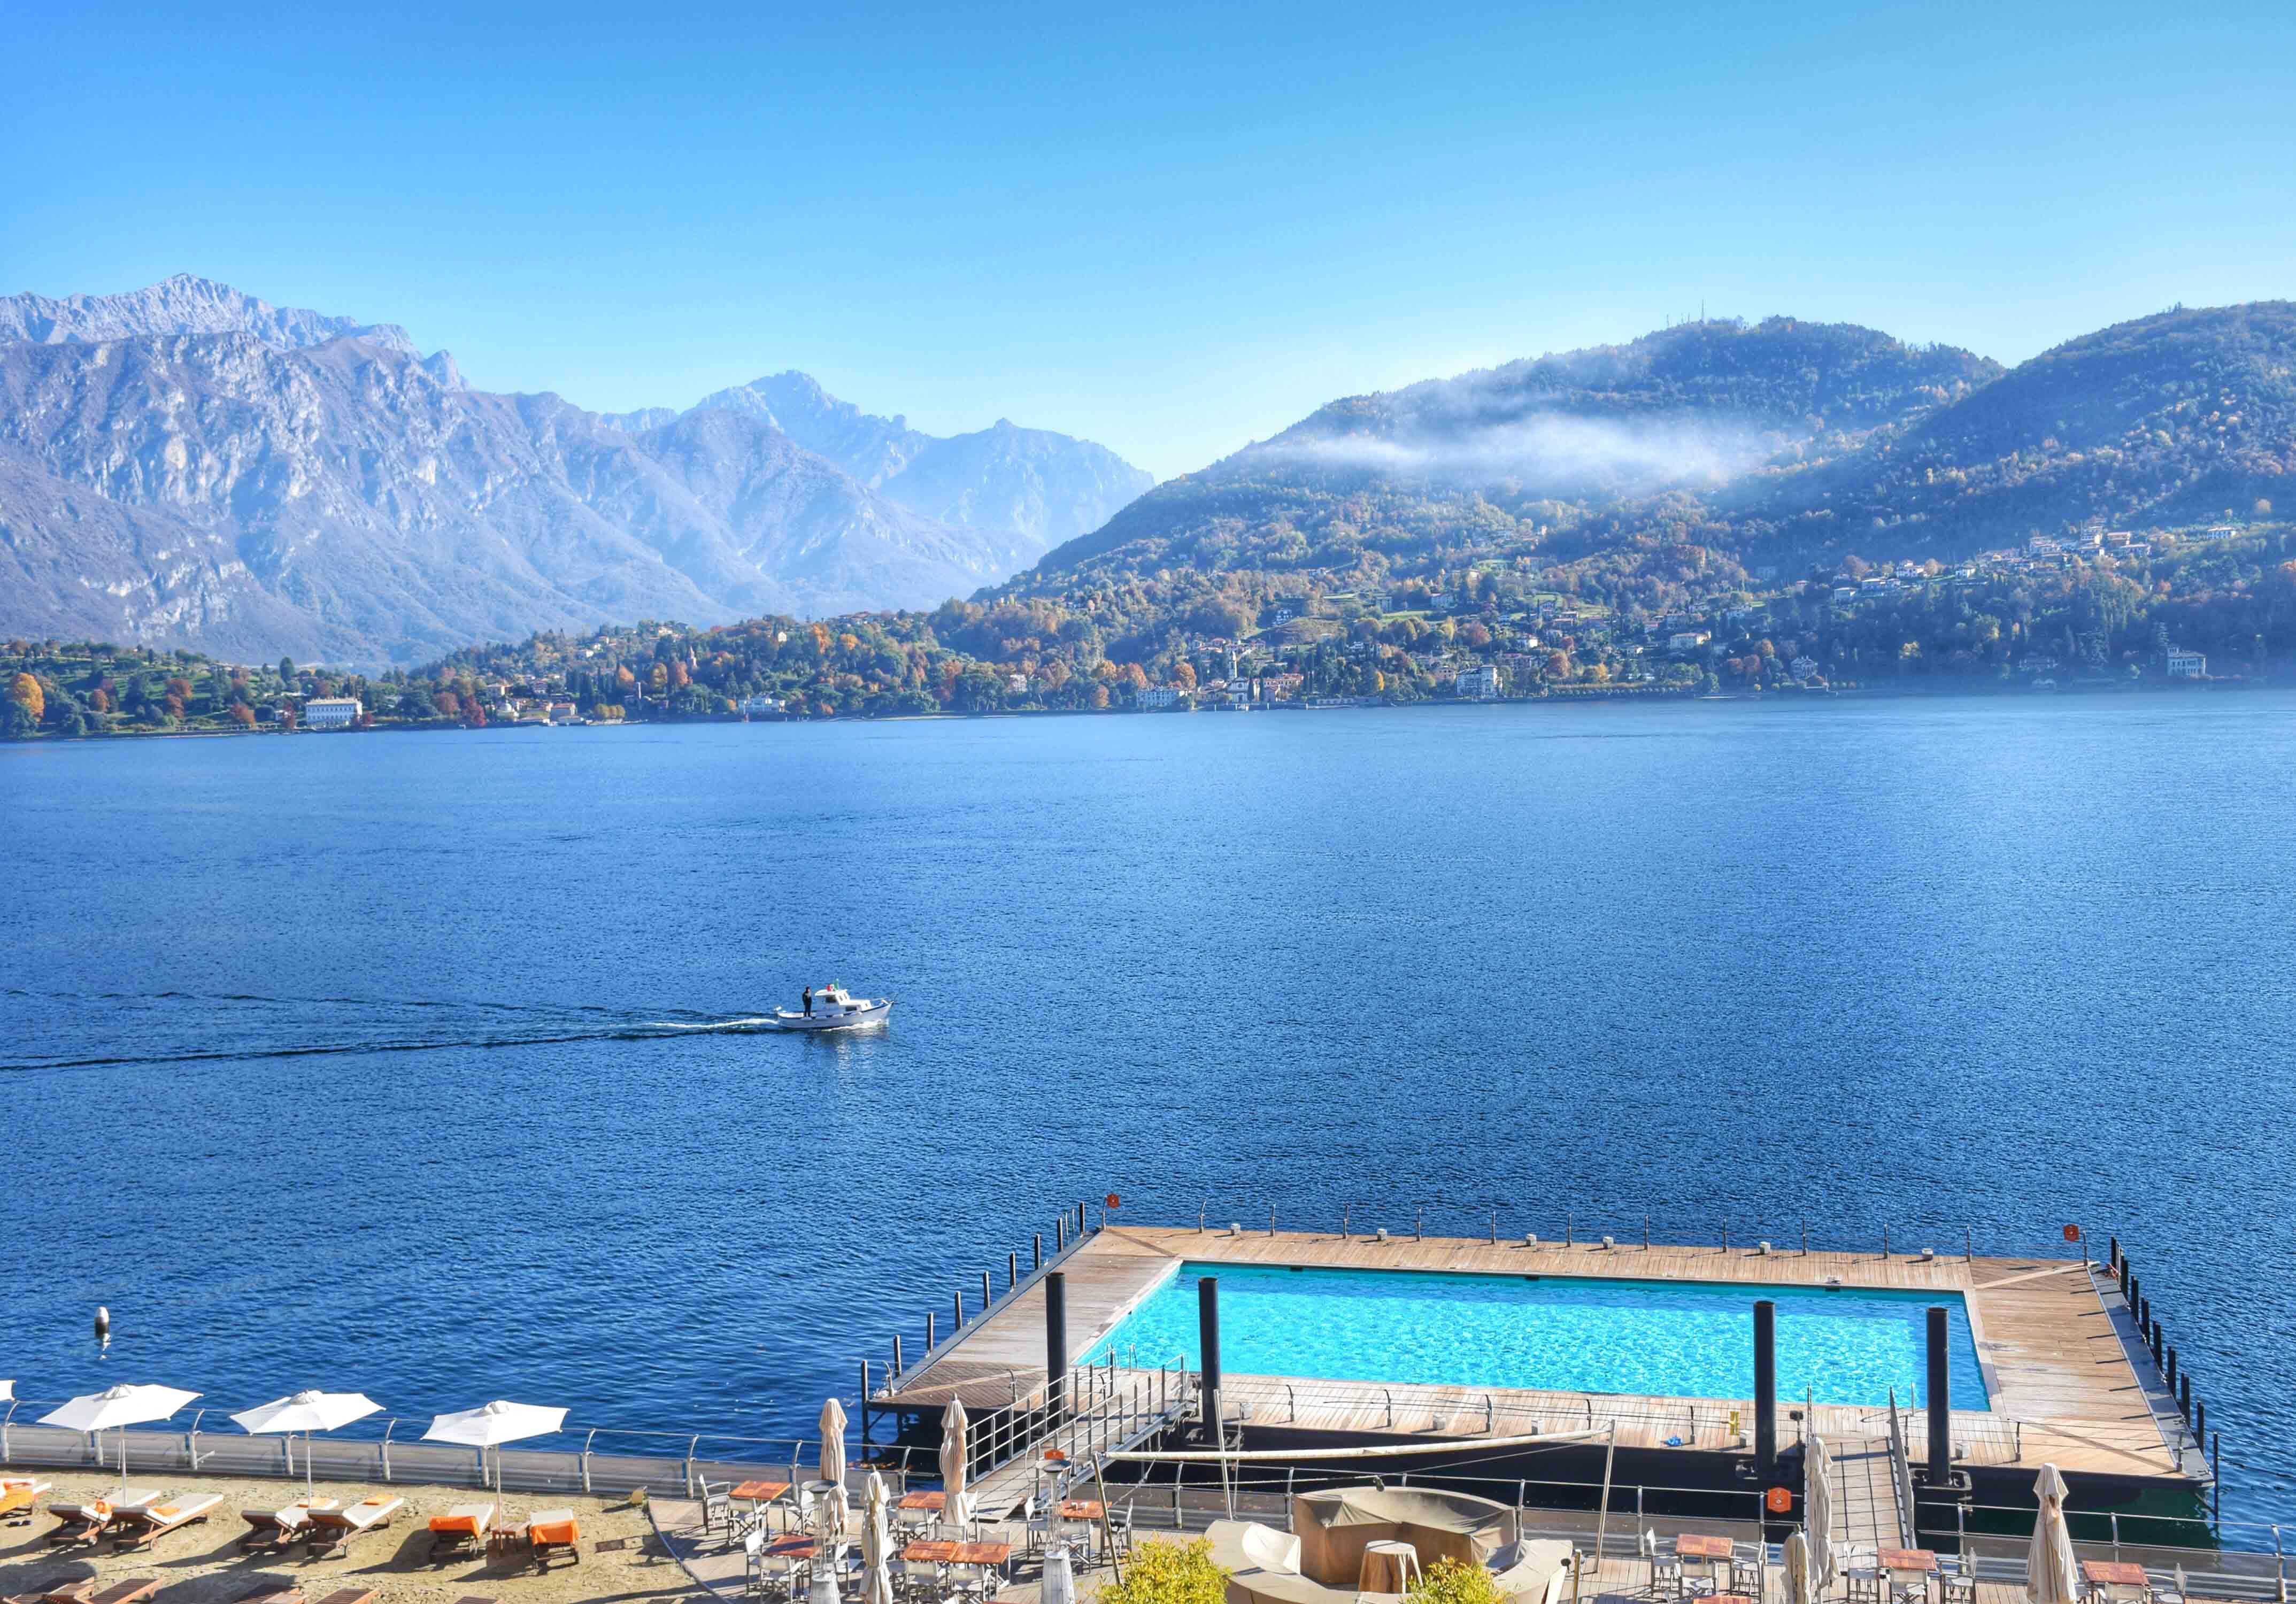 Vista das janelas do Grand Hotel Tremezzo no Lago di Como, Itália | foto: Lala Rebelo